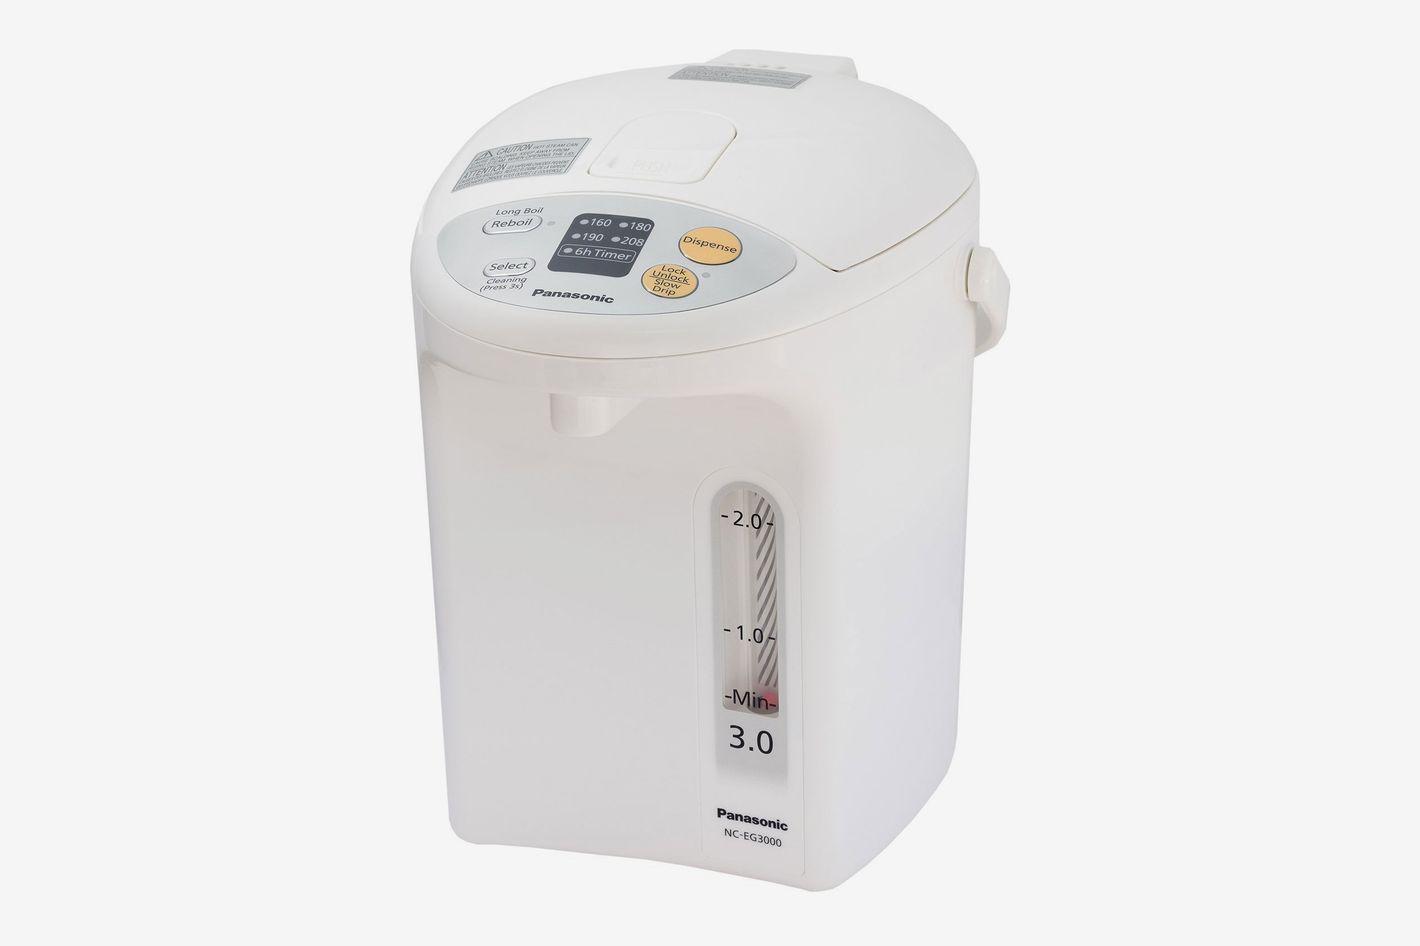 Panasonic RA41660 Electric Thermo Pot Water Boiler Dispenser